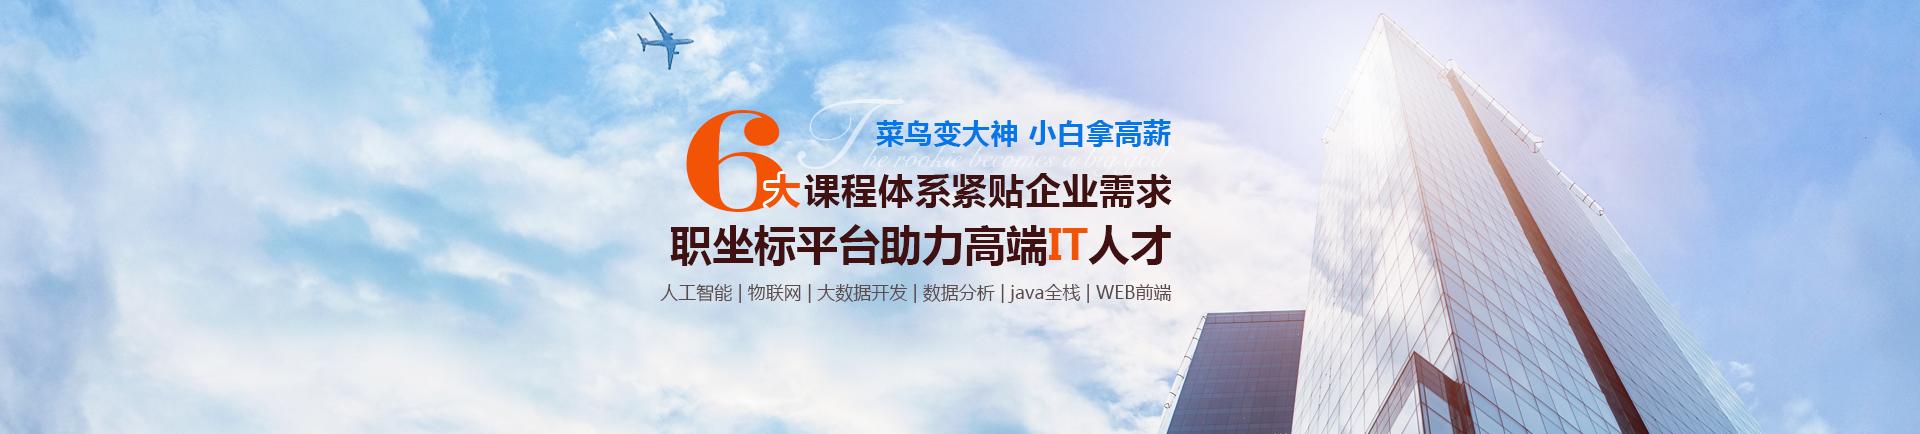 JavaEE分布�架构技能修炼 轻��破年薪30万-hunan